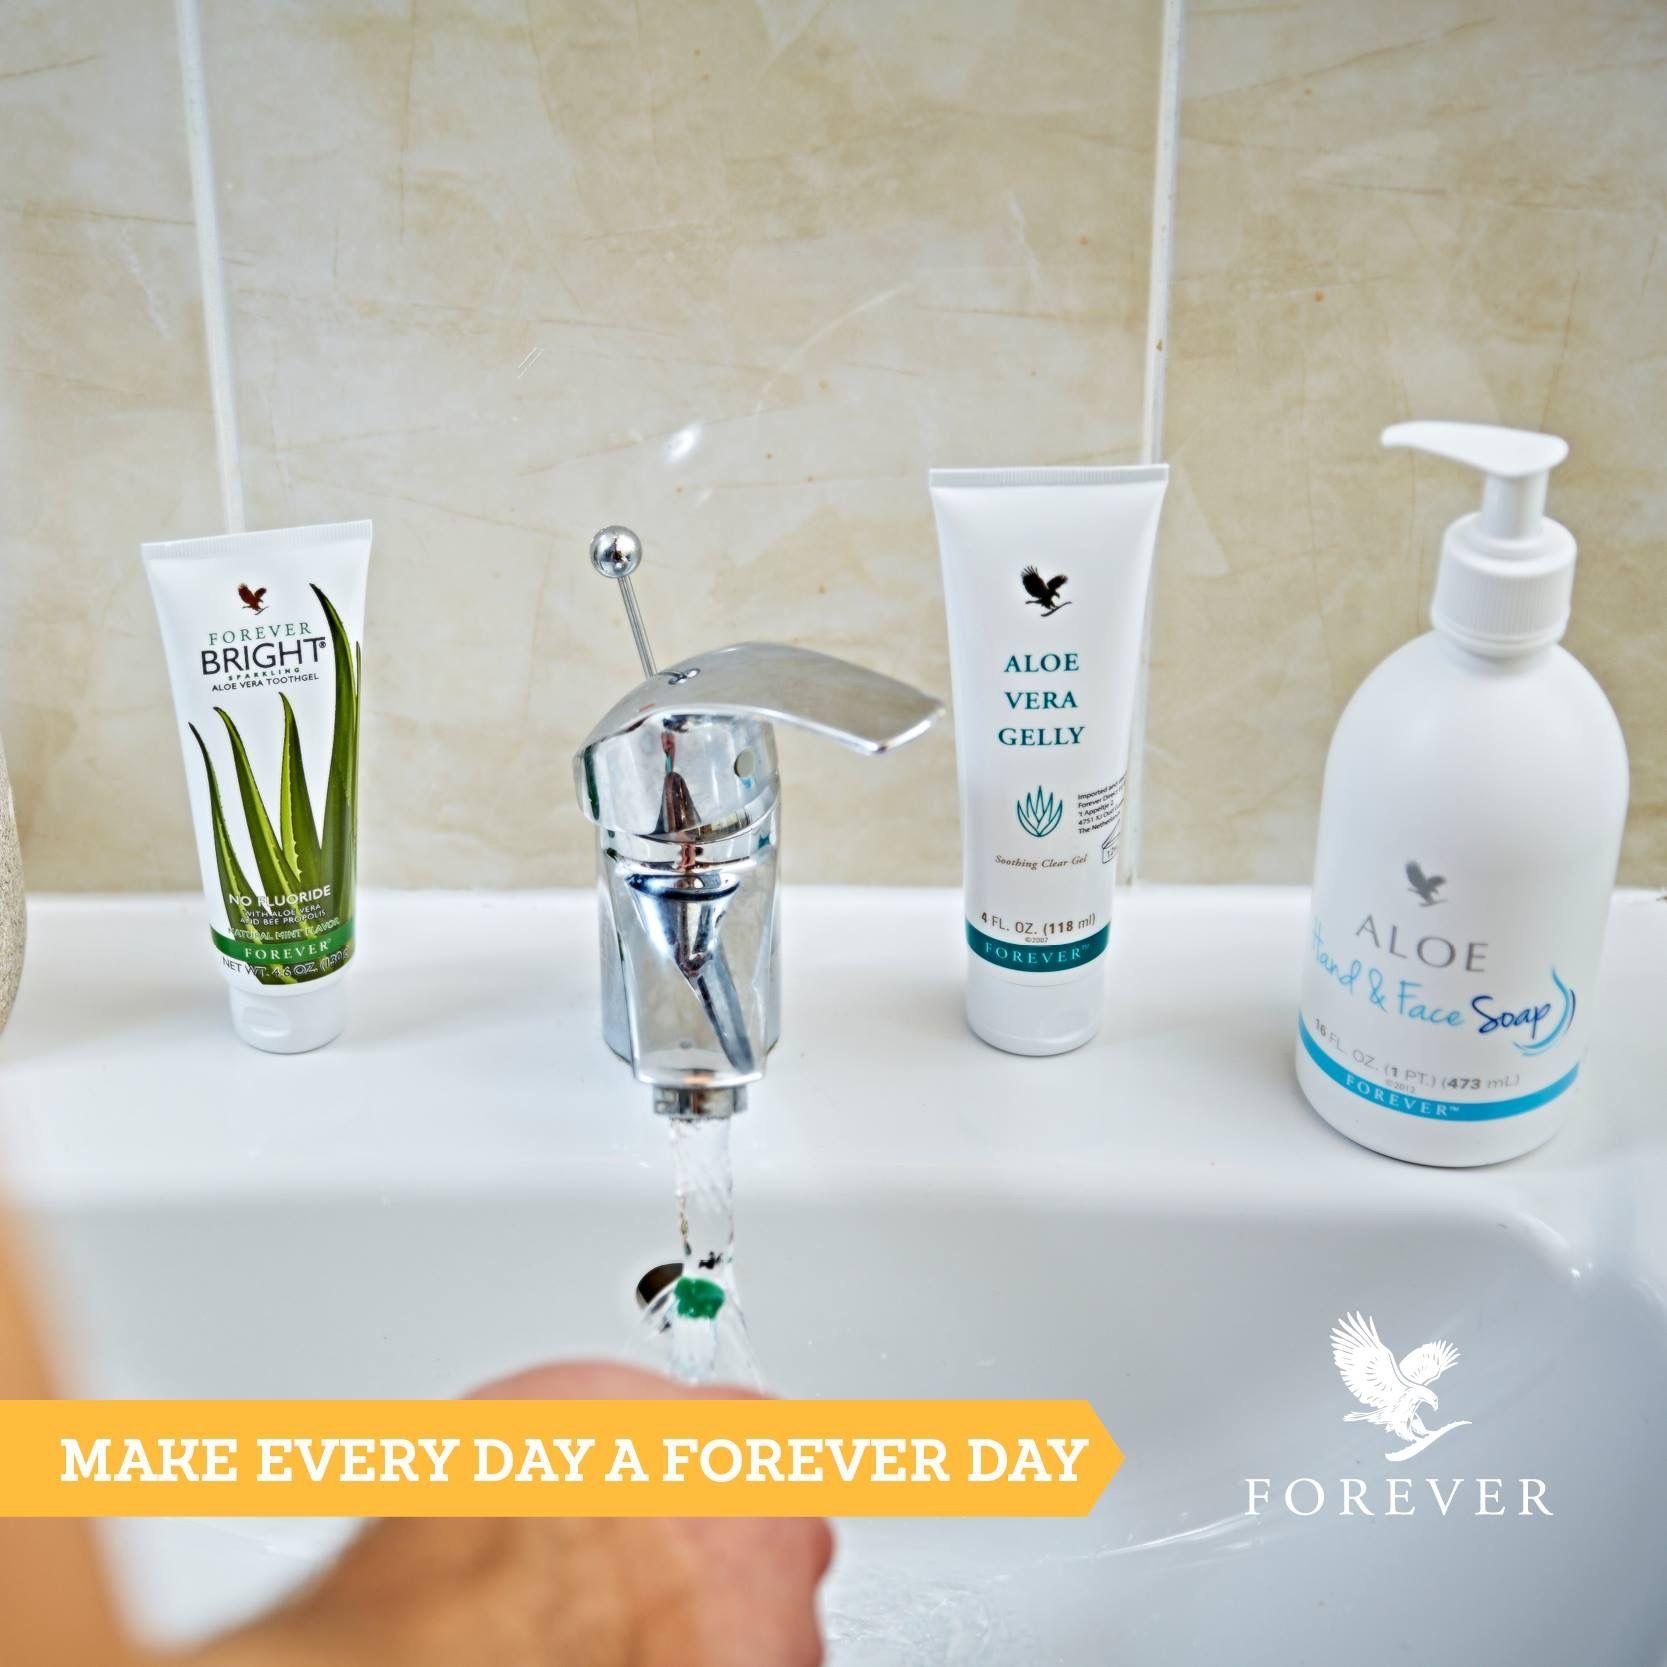 Bathroom Essentials three bathroom essentials from forever living. forever bright